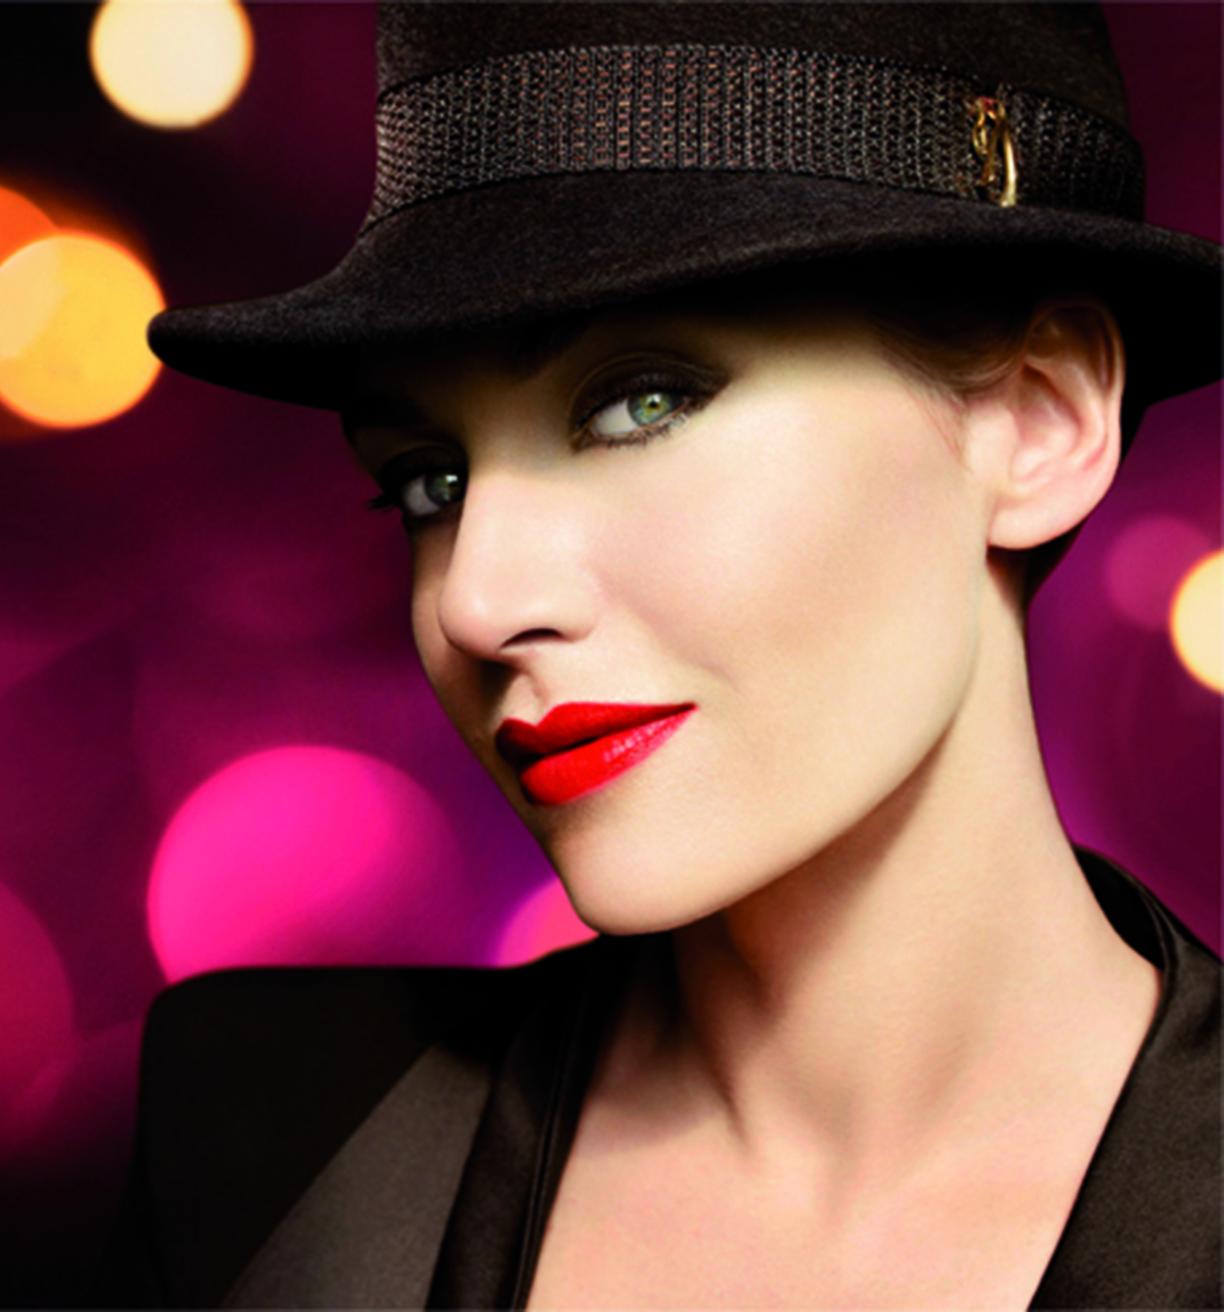 http://2.bp.blogspot.com/-0B0789mxi40/TtjEw9WluaI/AAAAAAAAHJ0/k4OlFv97EmI/s1600/Golden+Hat+Collection+Kate+Winslet.jpg